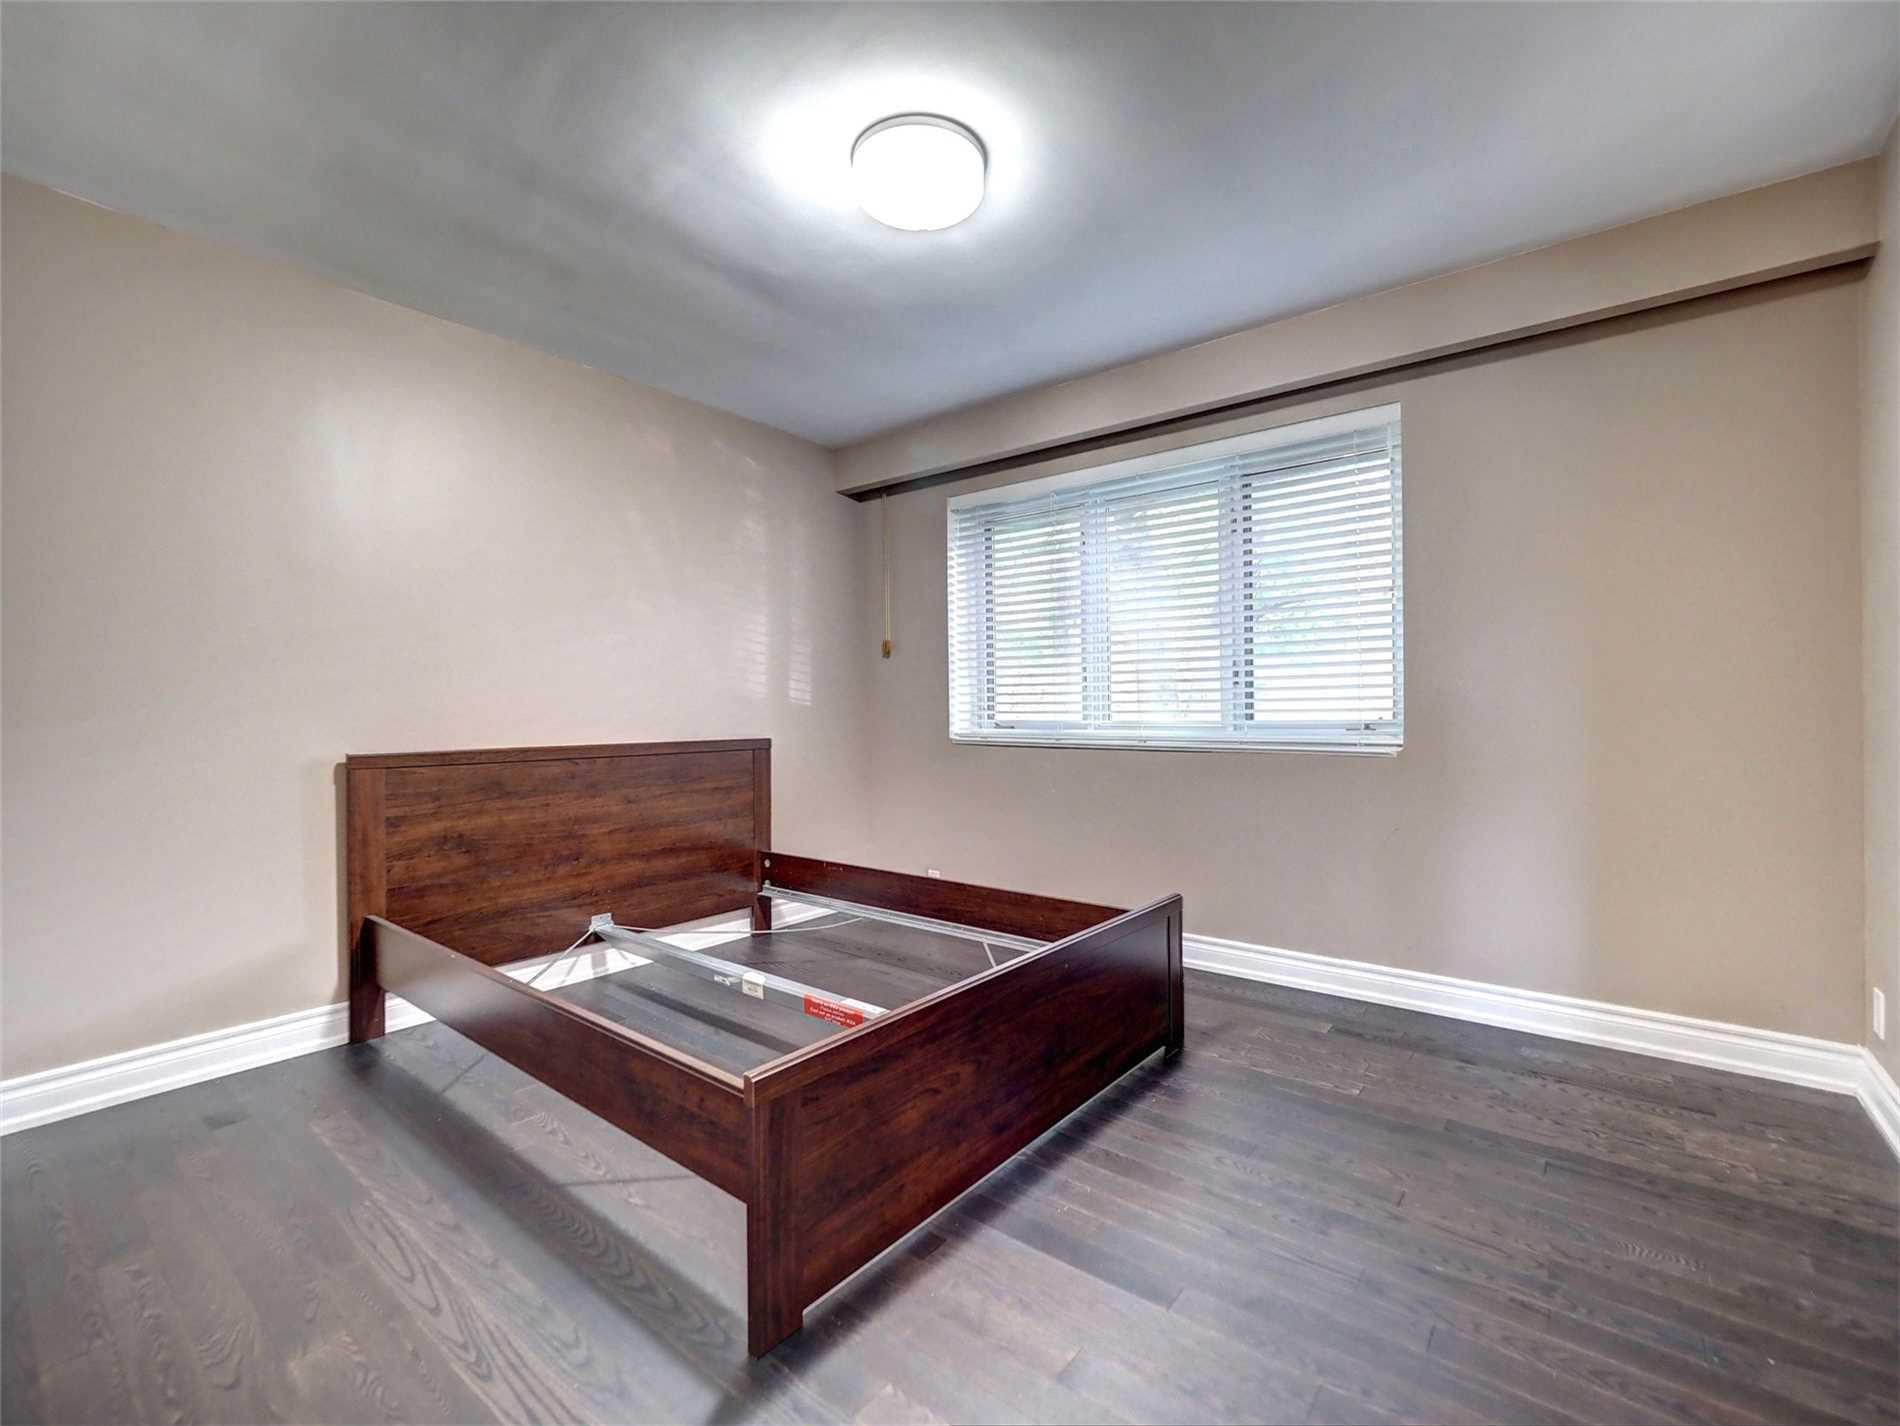 Detached house For Lease In Richmond Hill - 368 Fesserton Rd, Richmond Hill, Ontario, Canada L4C1G2 , 3 Bedrooms Bedrooms, ,2 BathroomsBathrooms,Detached,For Lease,Fesserton